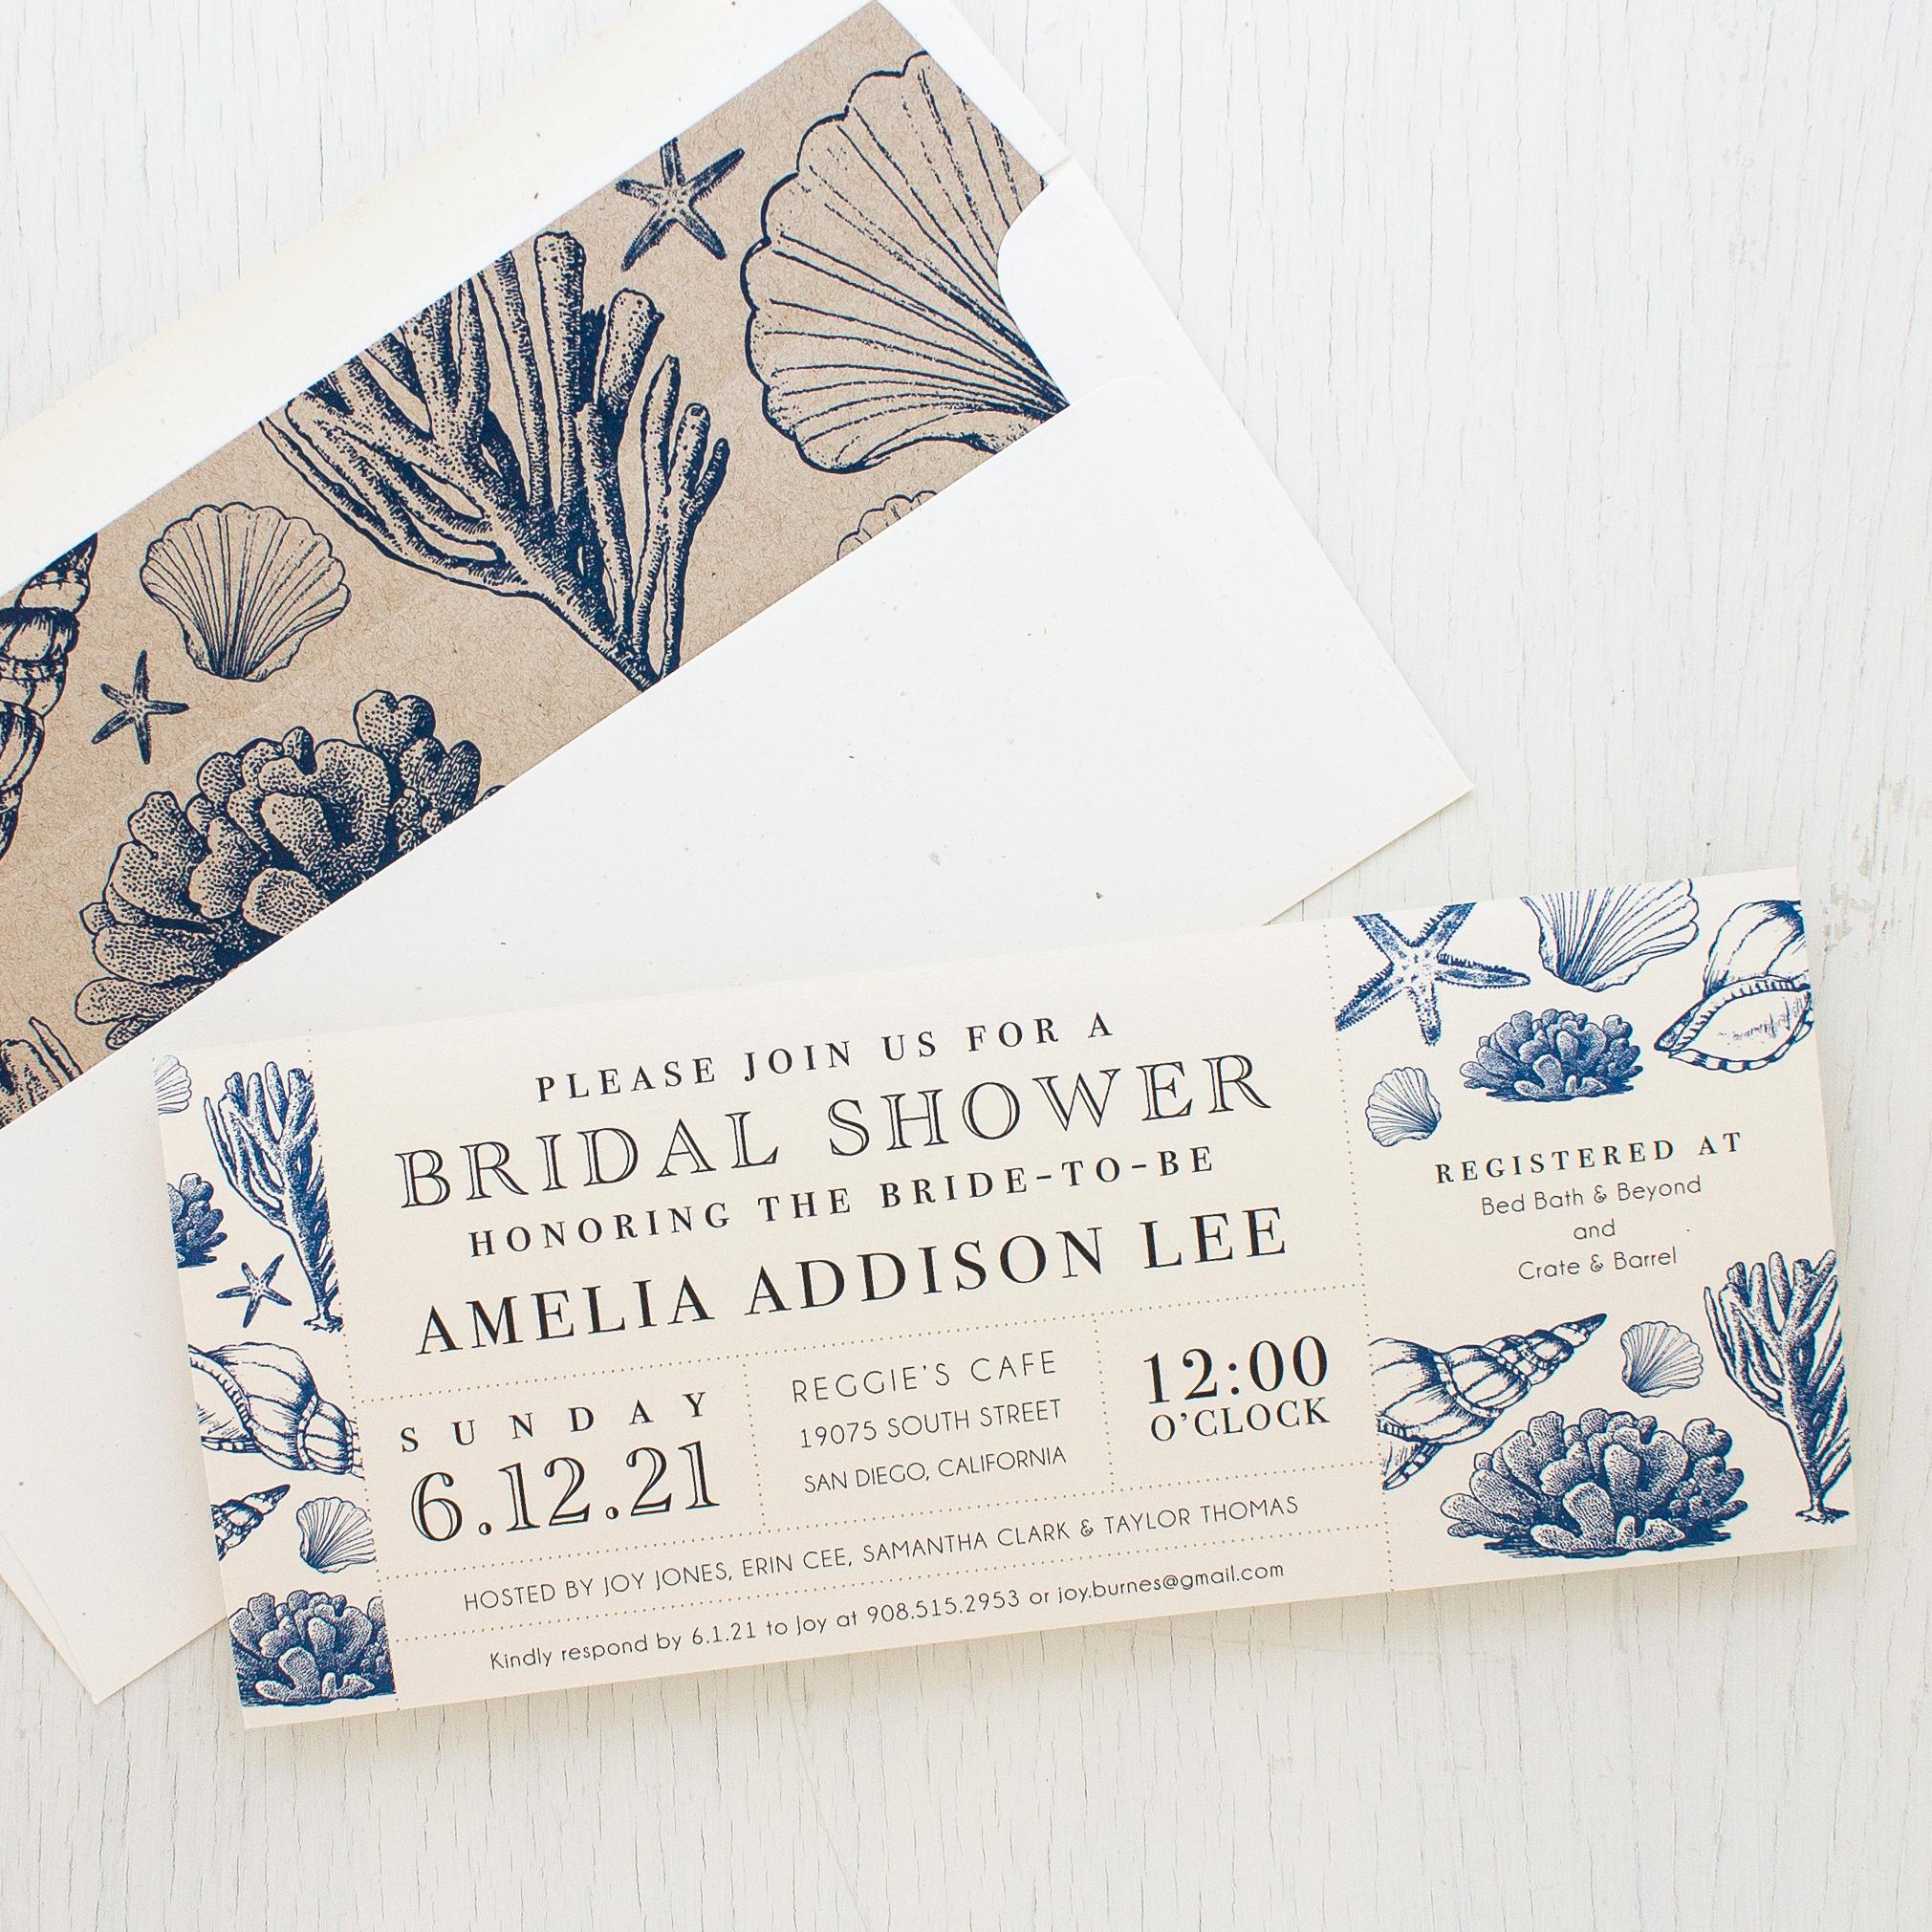 Greenback Shower Invitation Wording Elegant Beach Blues Bridal Shower Invitations